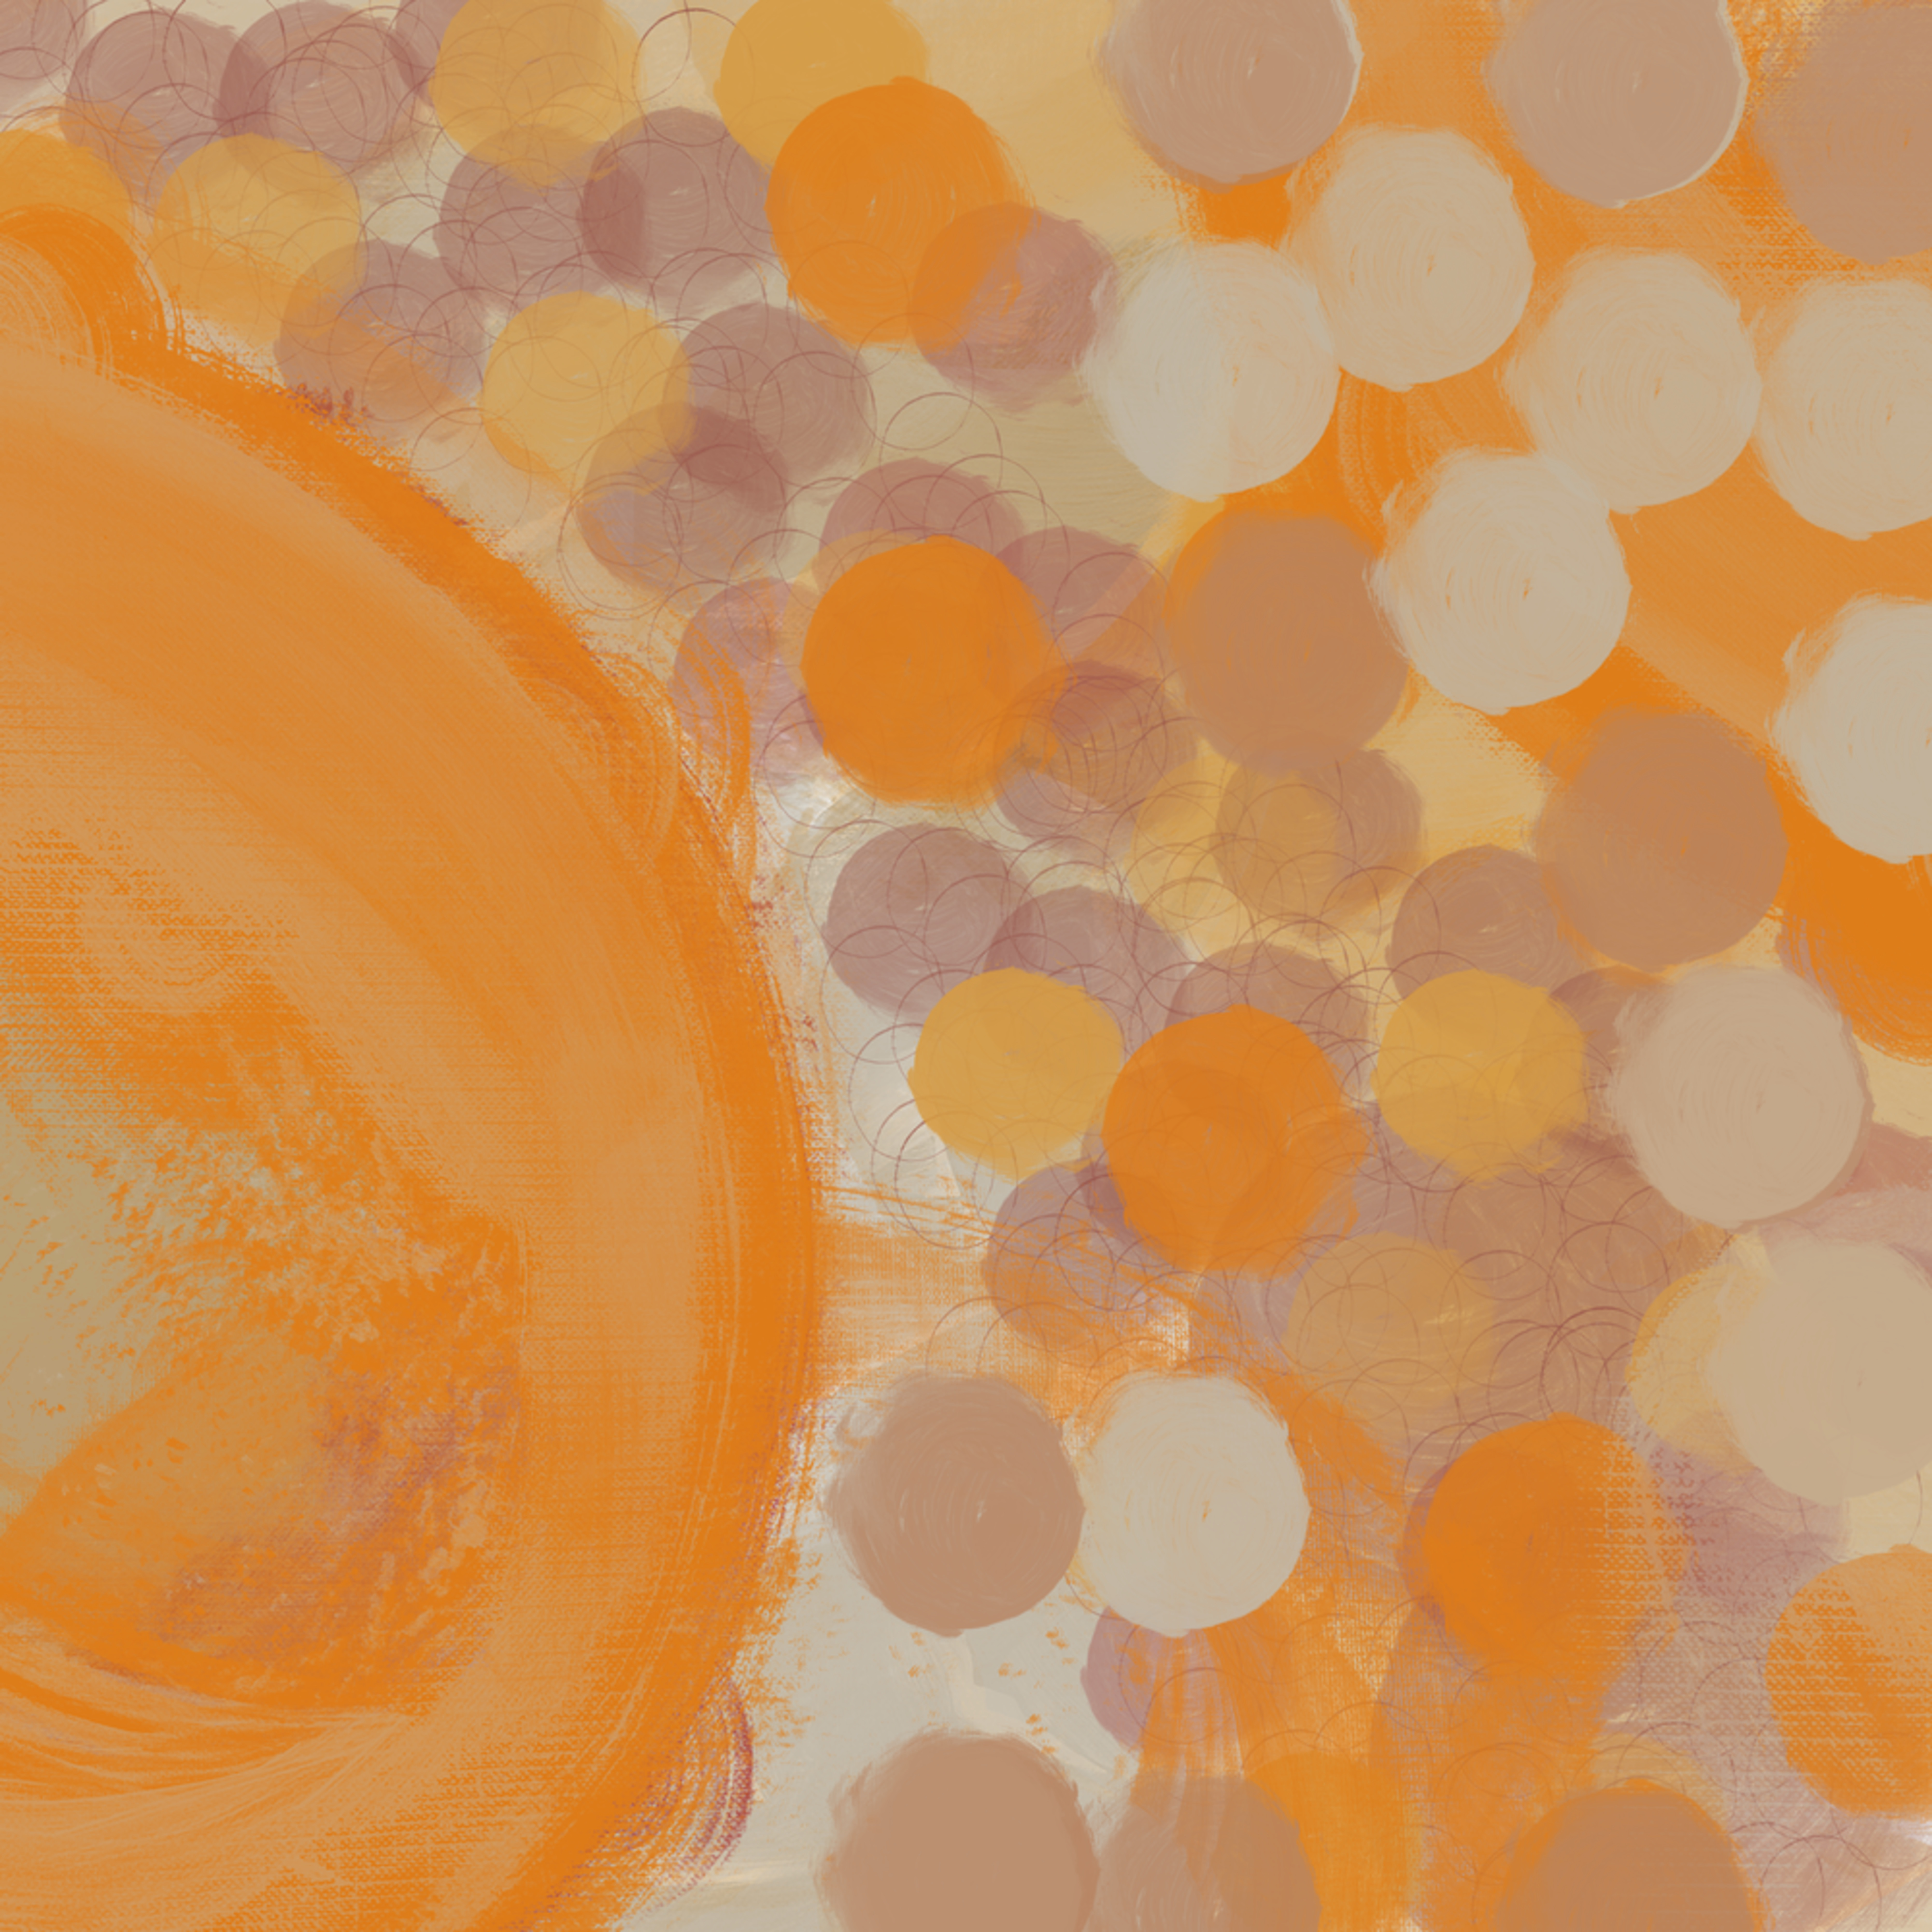 Abstract art 80 9 vkrcsa